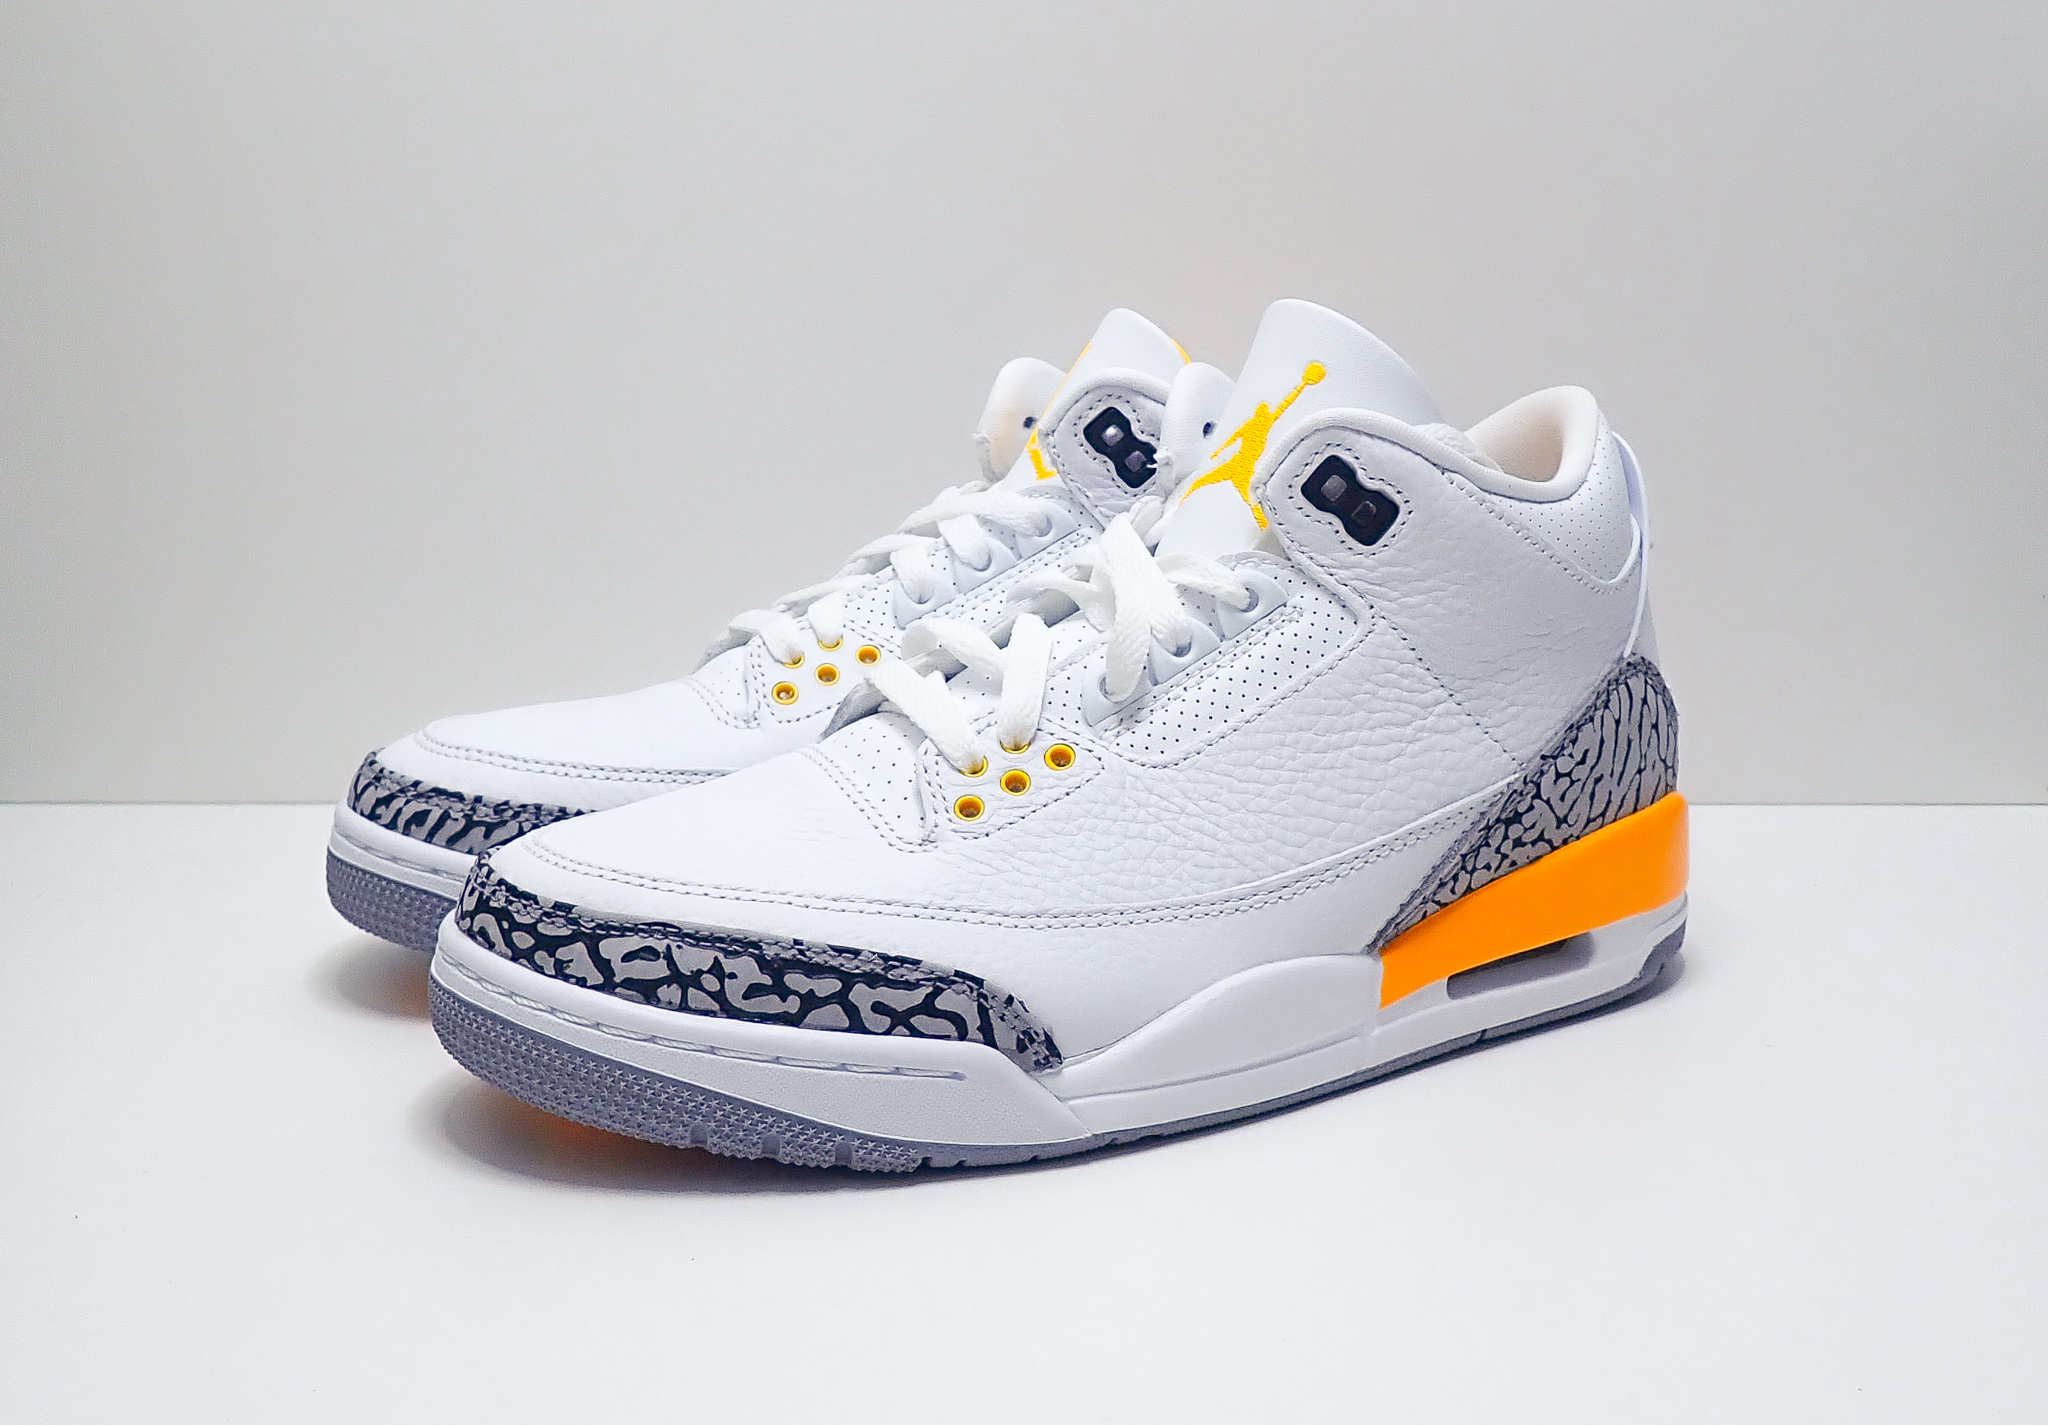 Jordan 3 Retro Laser Orange (W)